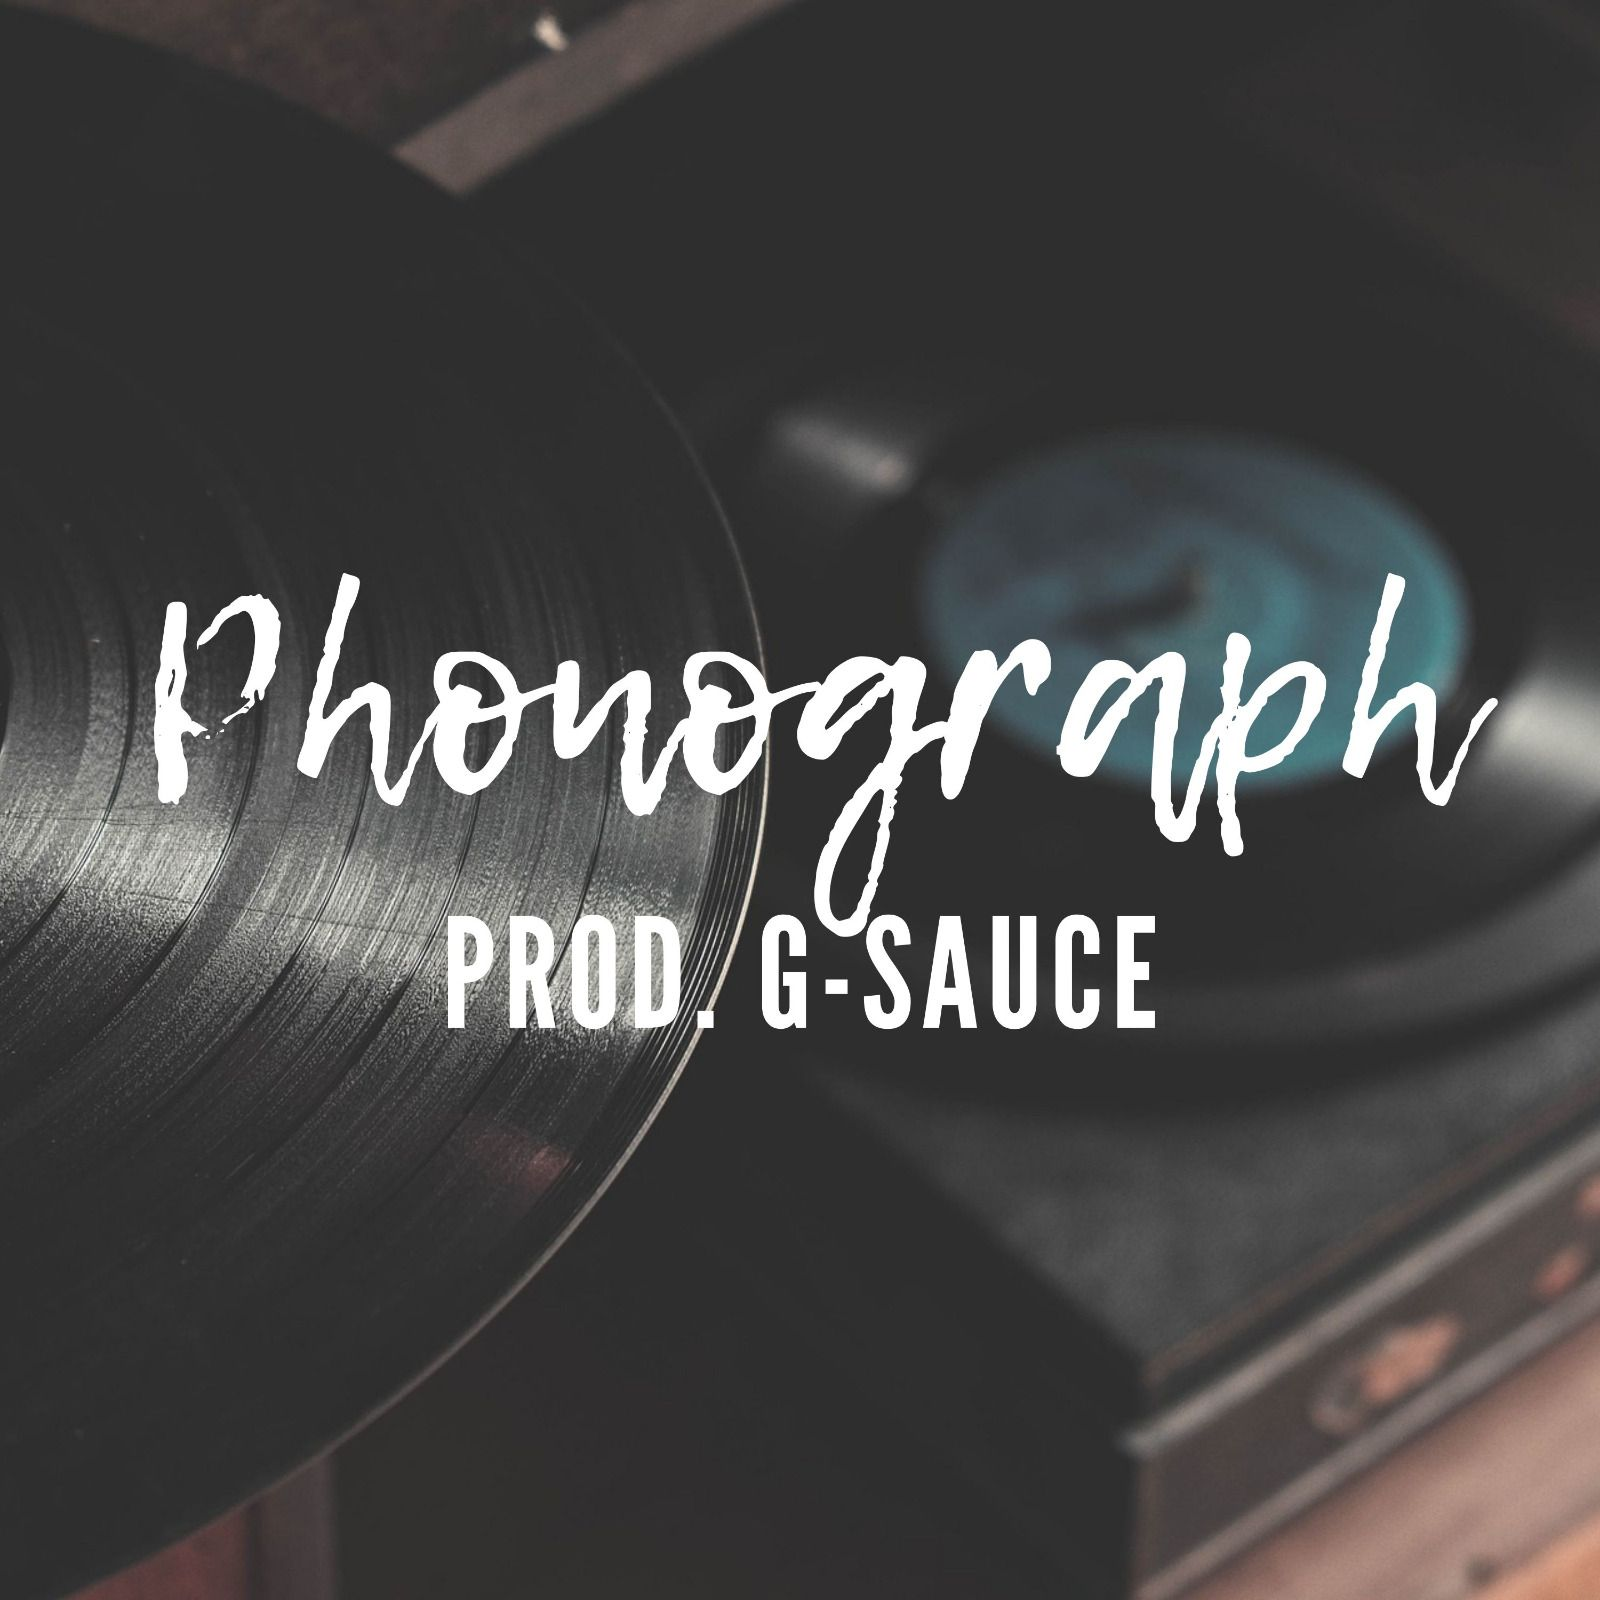 Phonograph (prod  G-Sauce) [75 Bpm LoFi Beat] by gsaucegotthemvibes